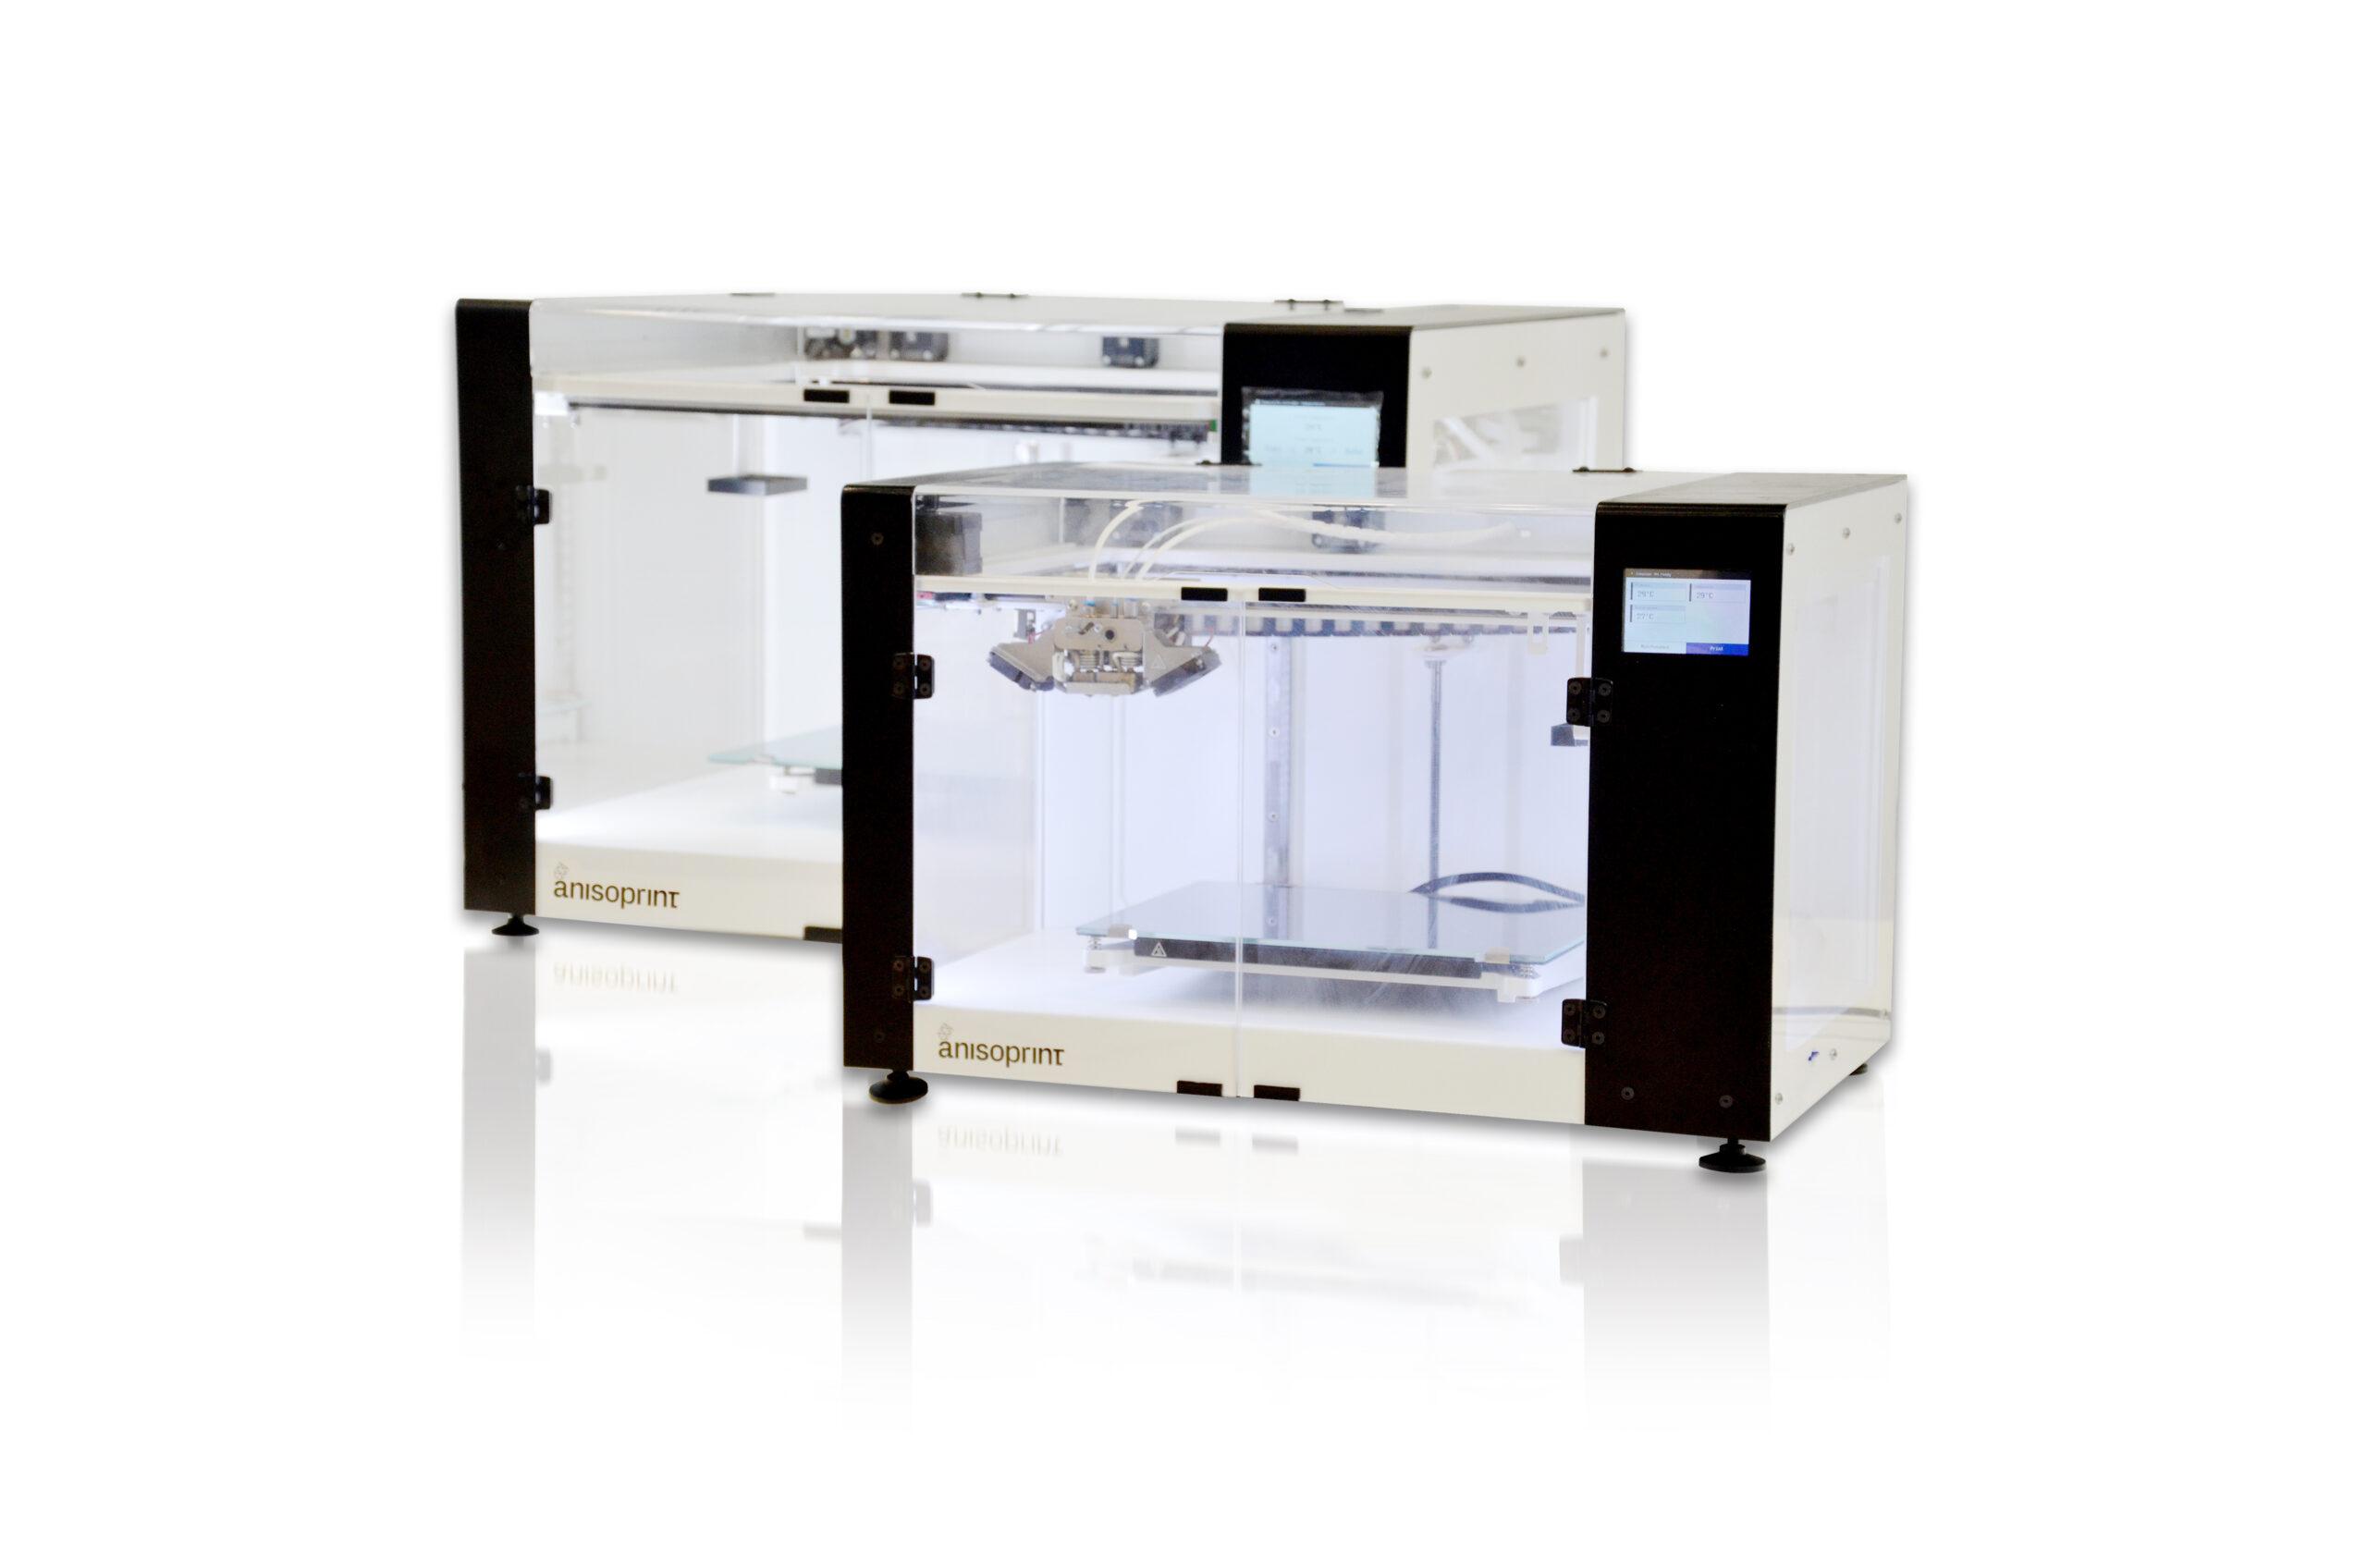 Anisopritn Composer series 3D printers